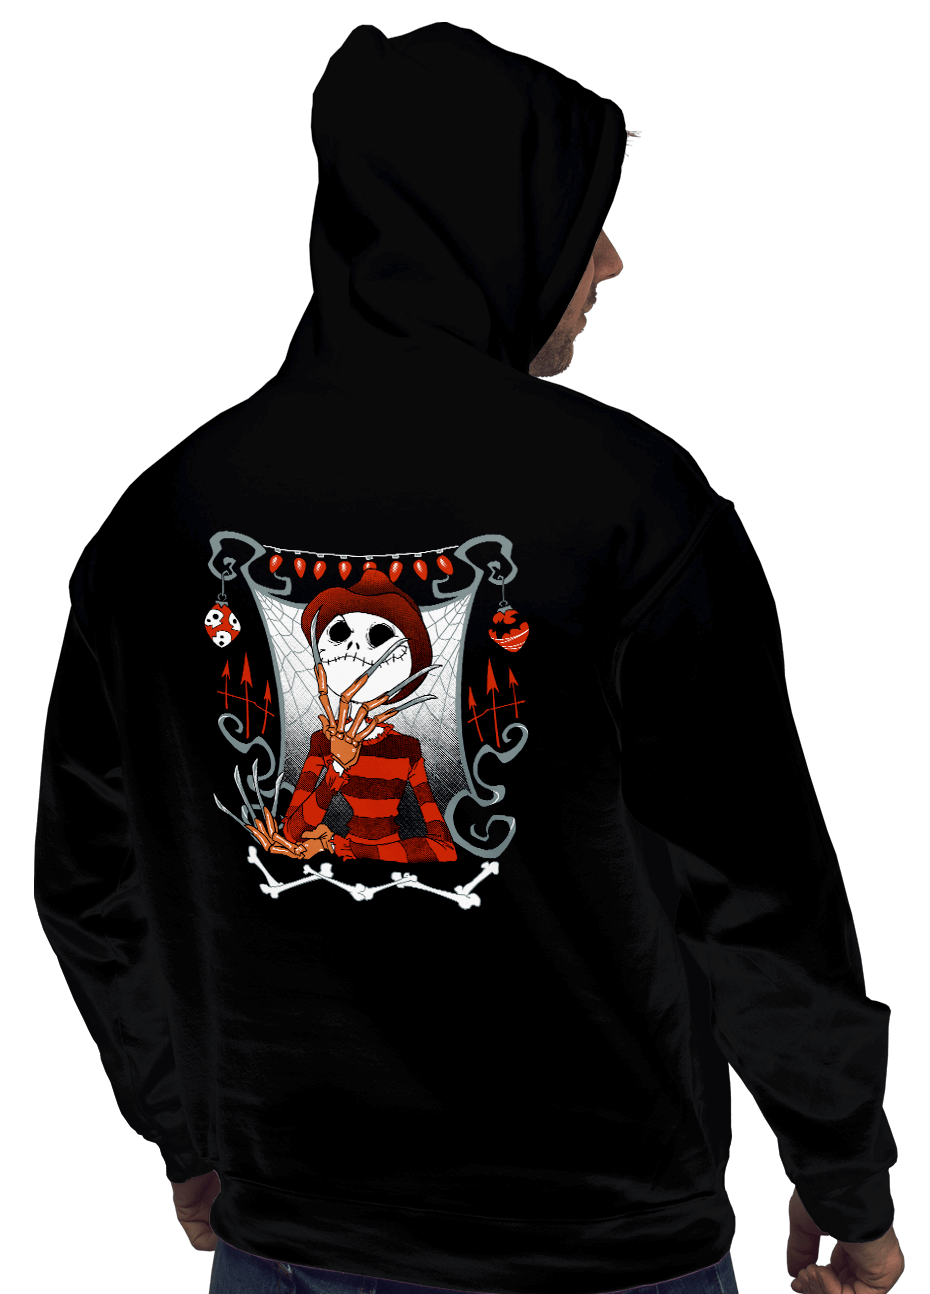 The Nightmare King | Nightmare Before Christmas | Shirt Punch!